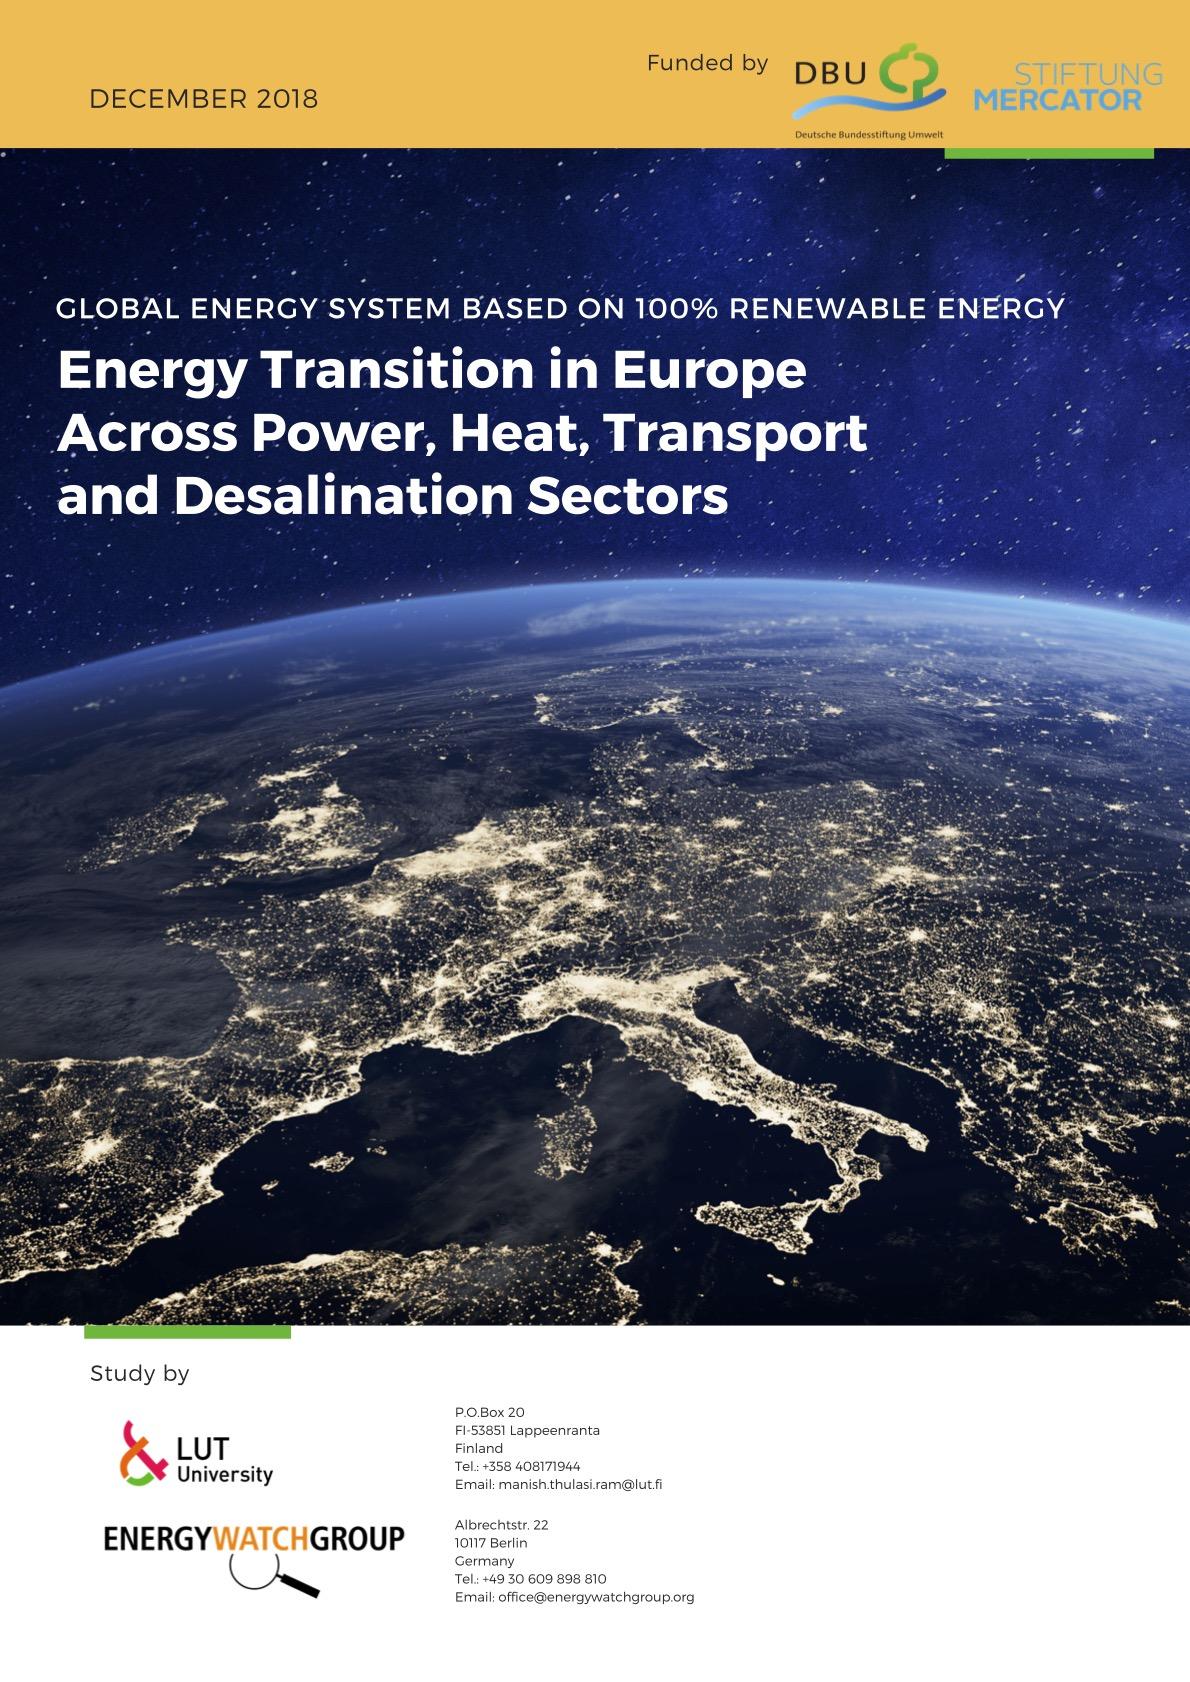 EWG-LUT_Full-Study_Energy-Transition-Europe